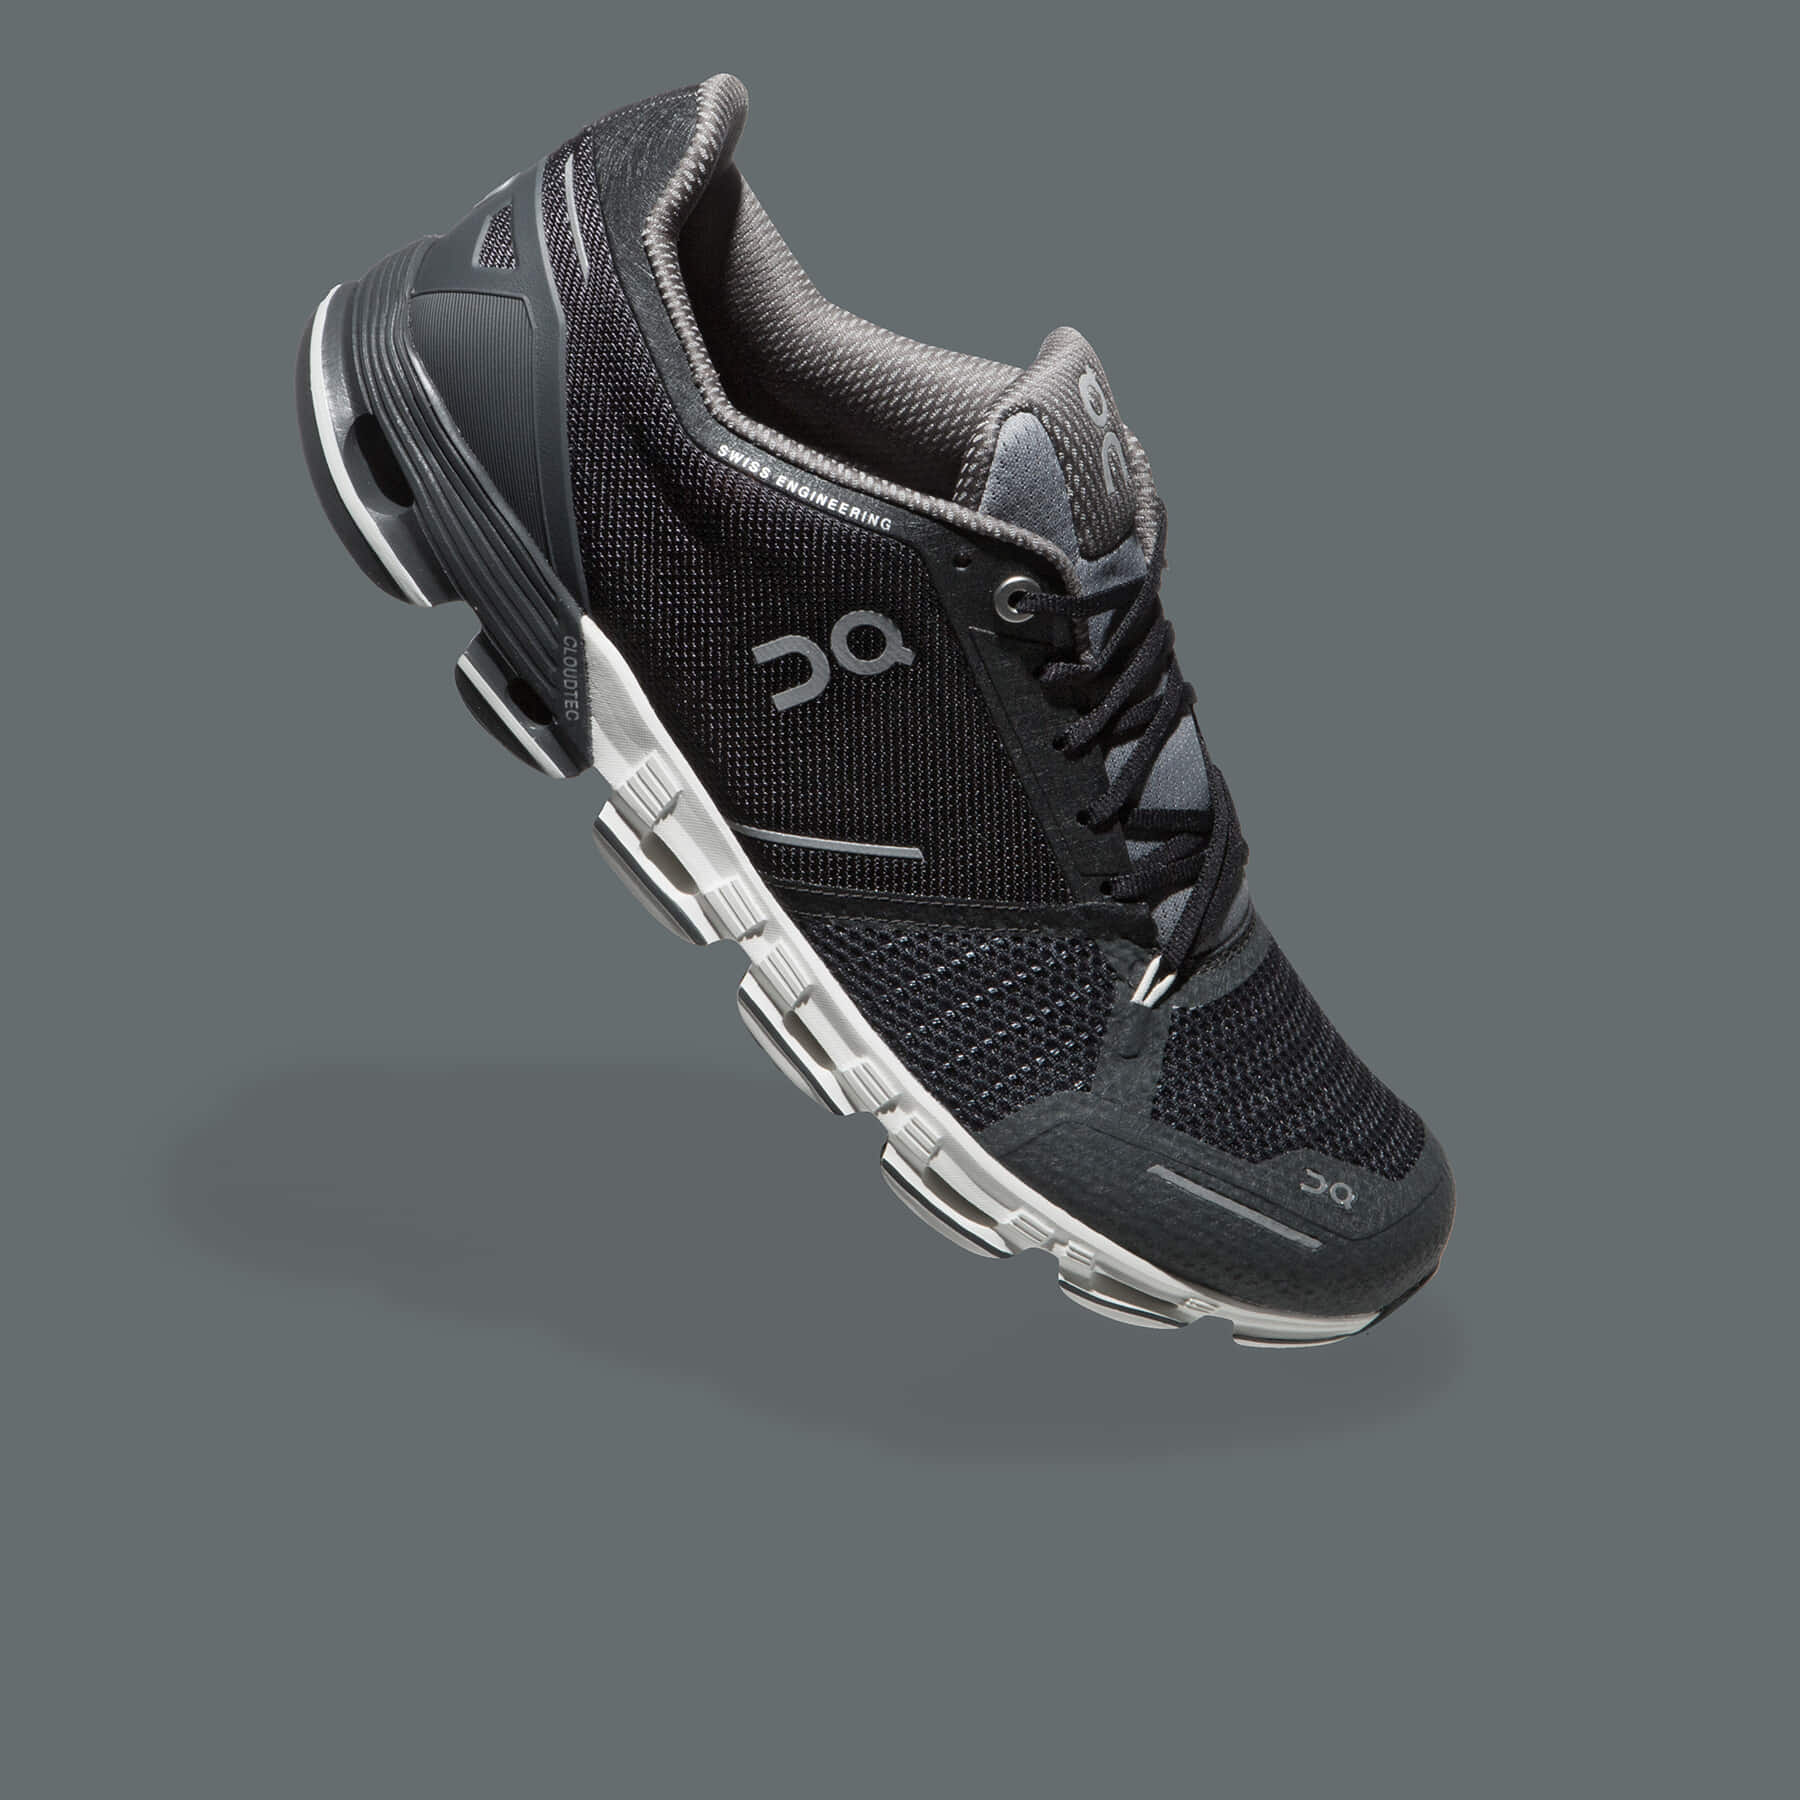 9f72c0912e9cb Cloudflyer - Lightweight Stability Running Shoes